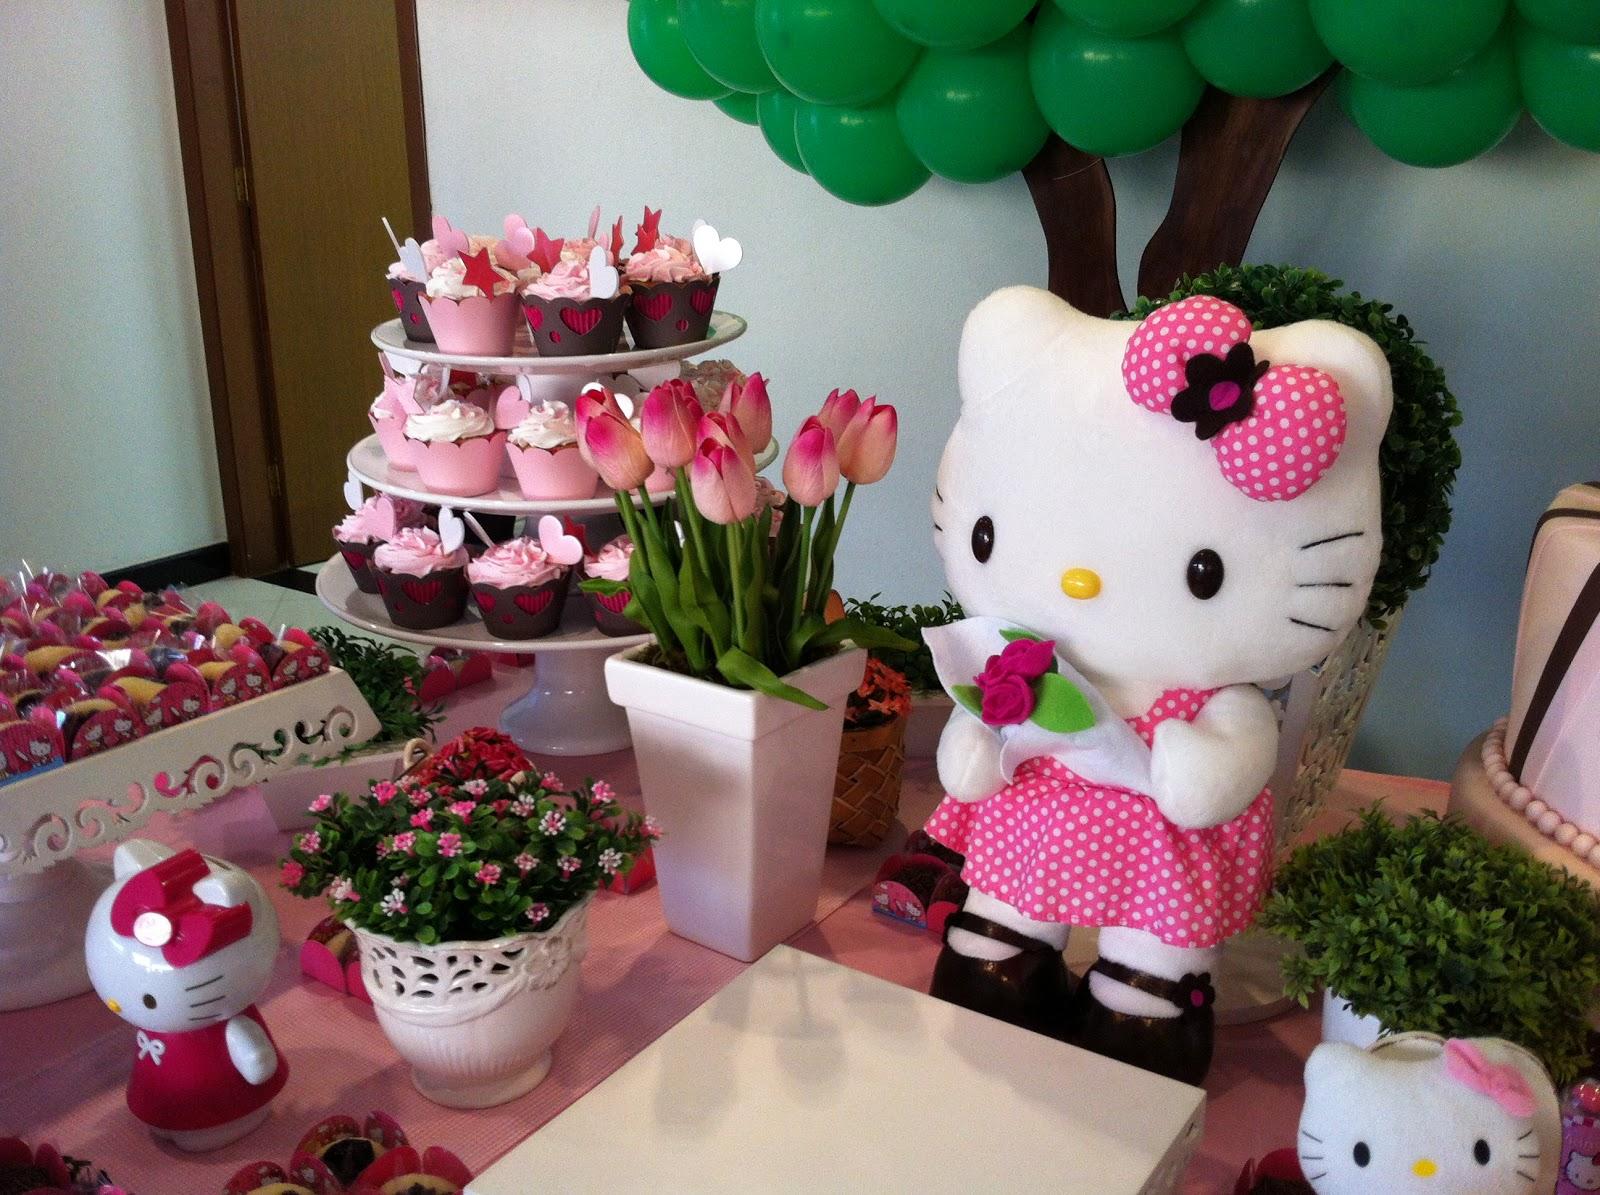 decoracao festa hello kitty:Decoração de Festa Infantil: Hello Kitty